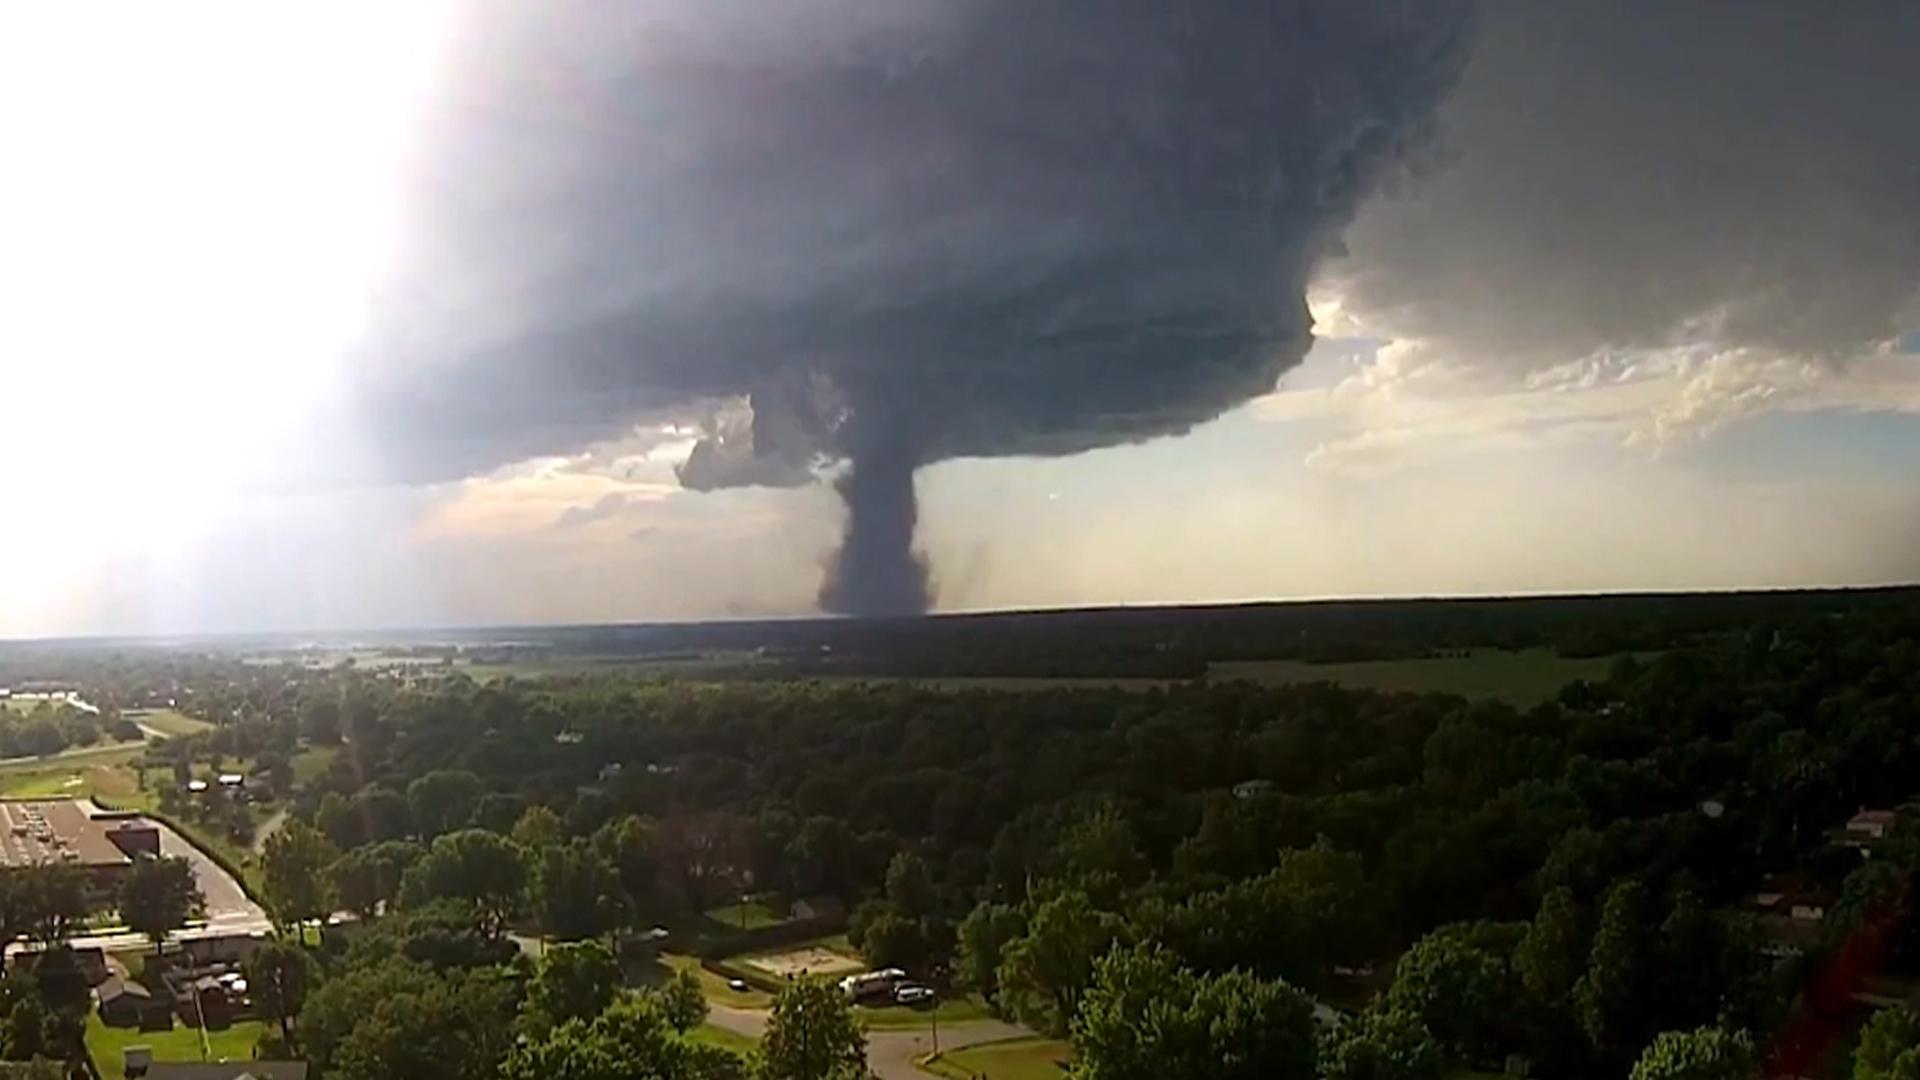 drone captures tornado touchdown